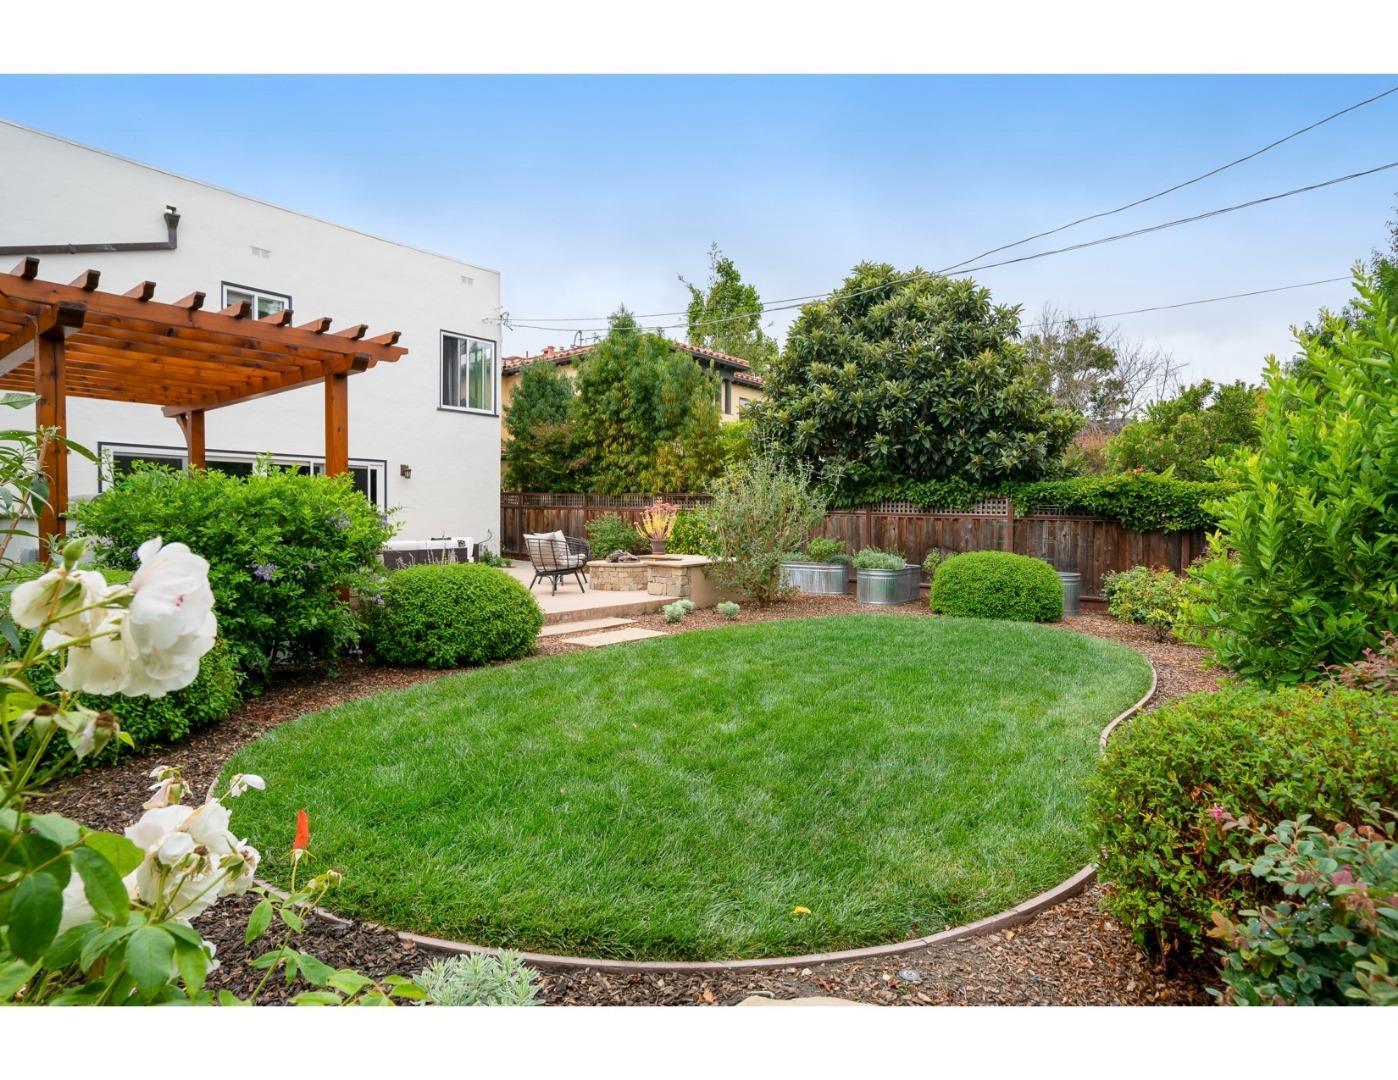 1204 Bernal Avenue Burlingame, CA 94010 - MLS #: ML81722355